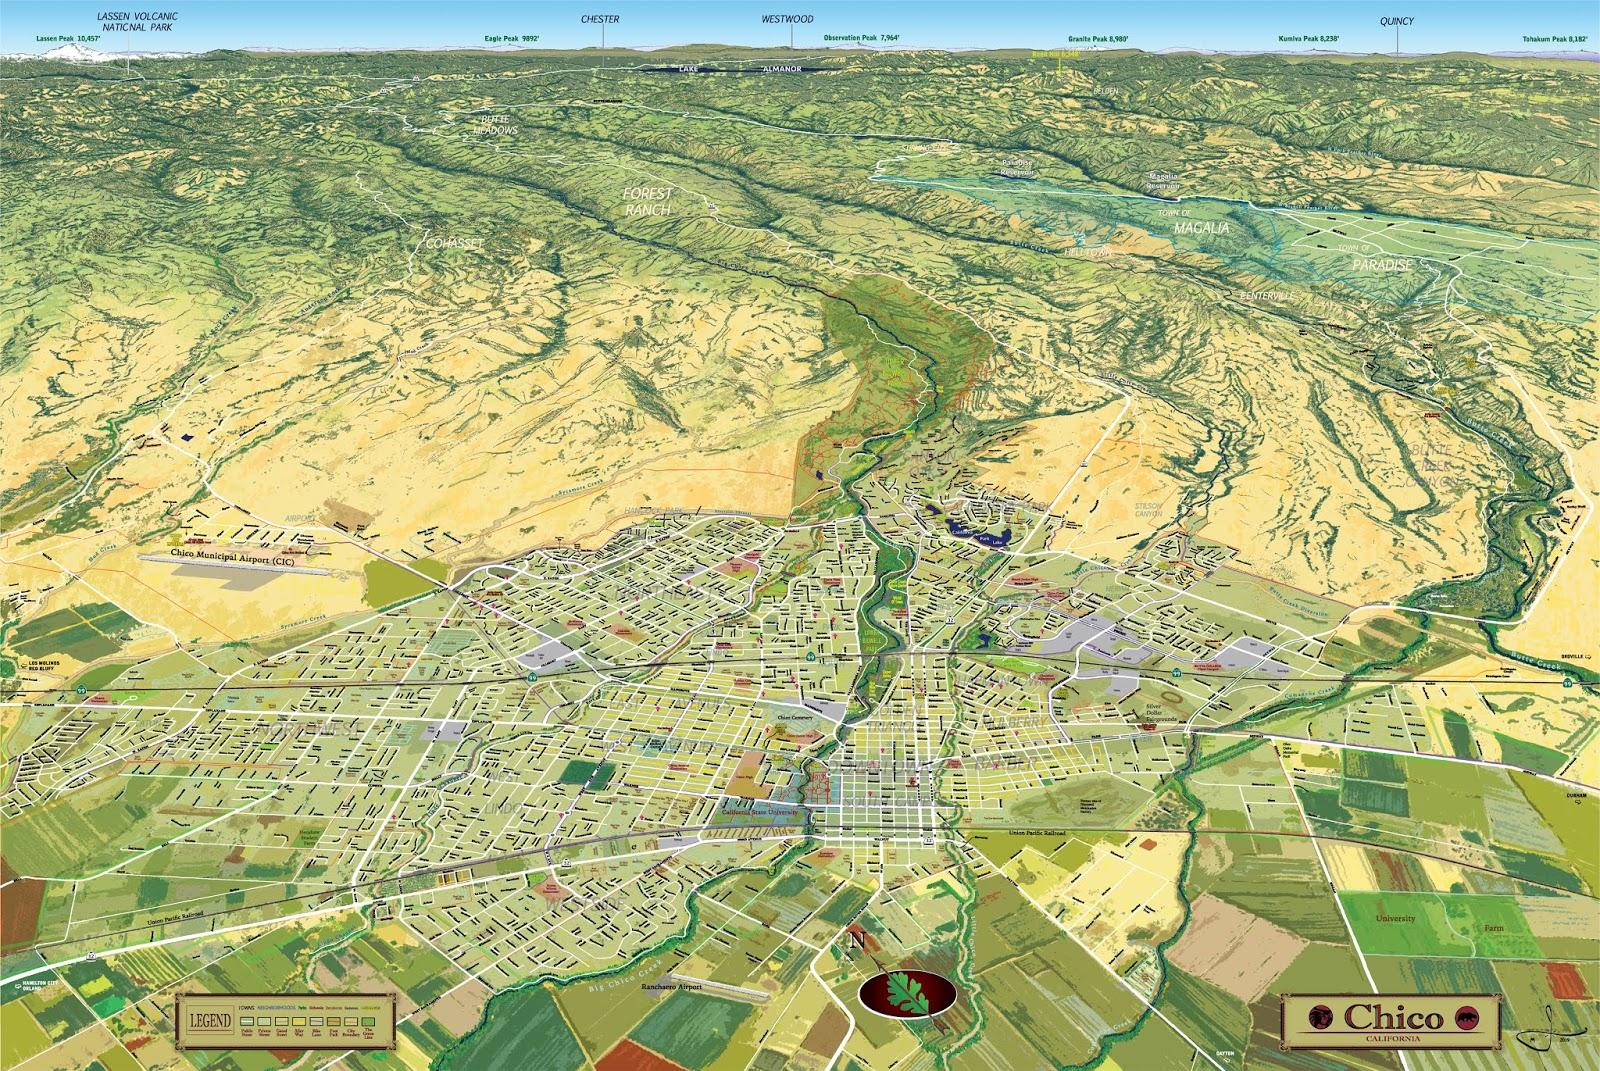 Mapa Jeff Cartography Chico California Panoramic Map